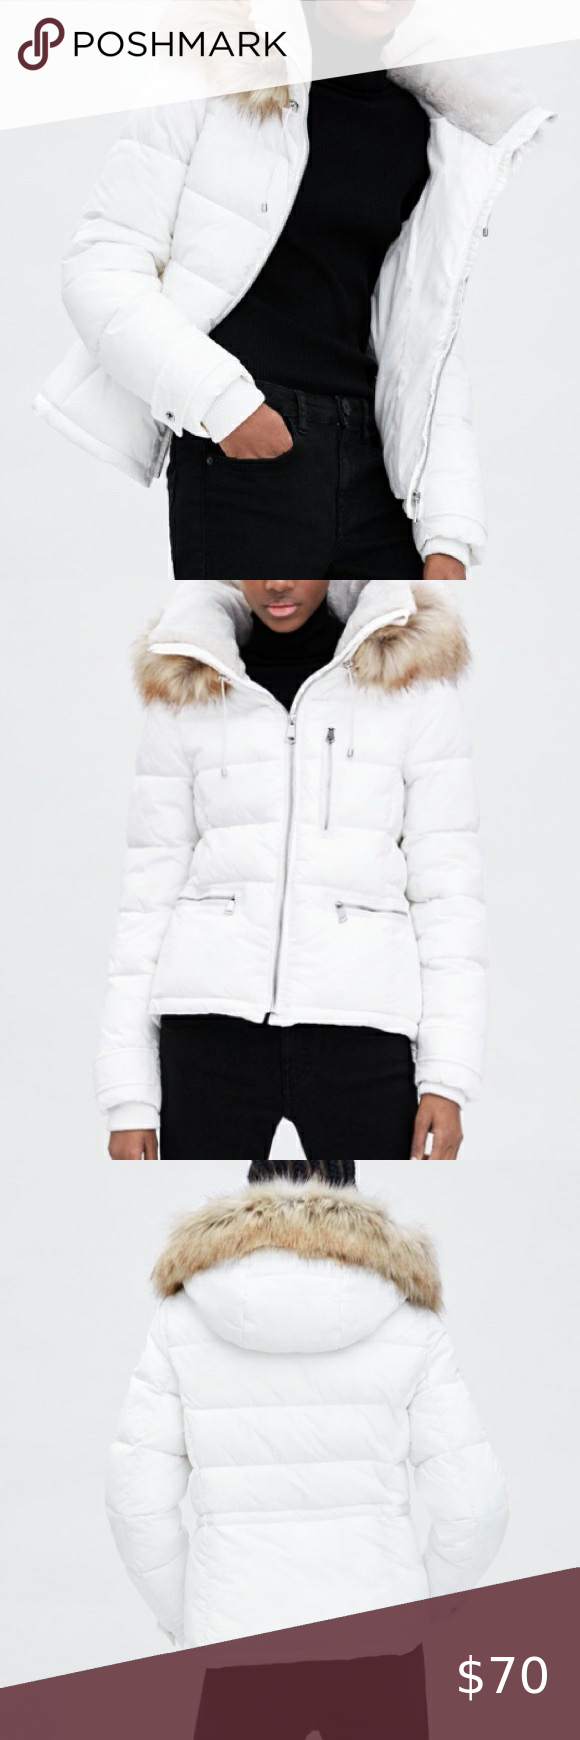 Nwt Zara Water Resistant Puffer Jacket Hood Size S Long Puffer Coat Coats Jackets Women Puffer Jackets [ 1740 x 580 Pixel ]